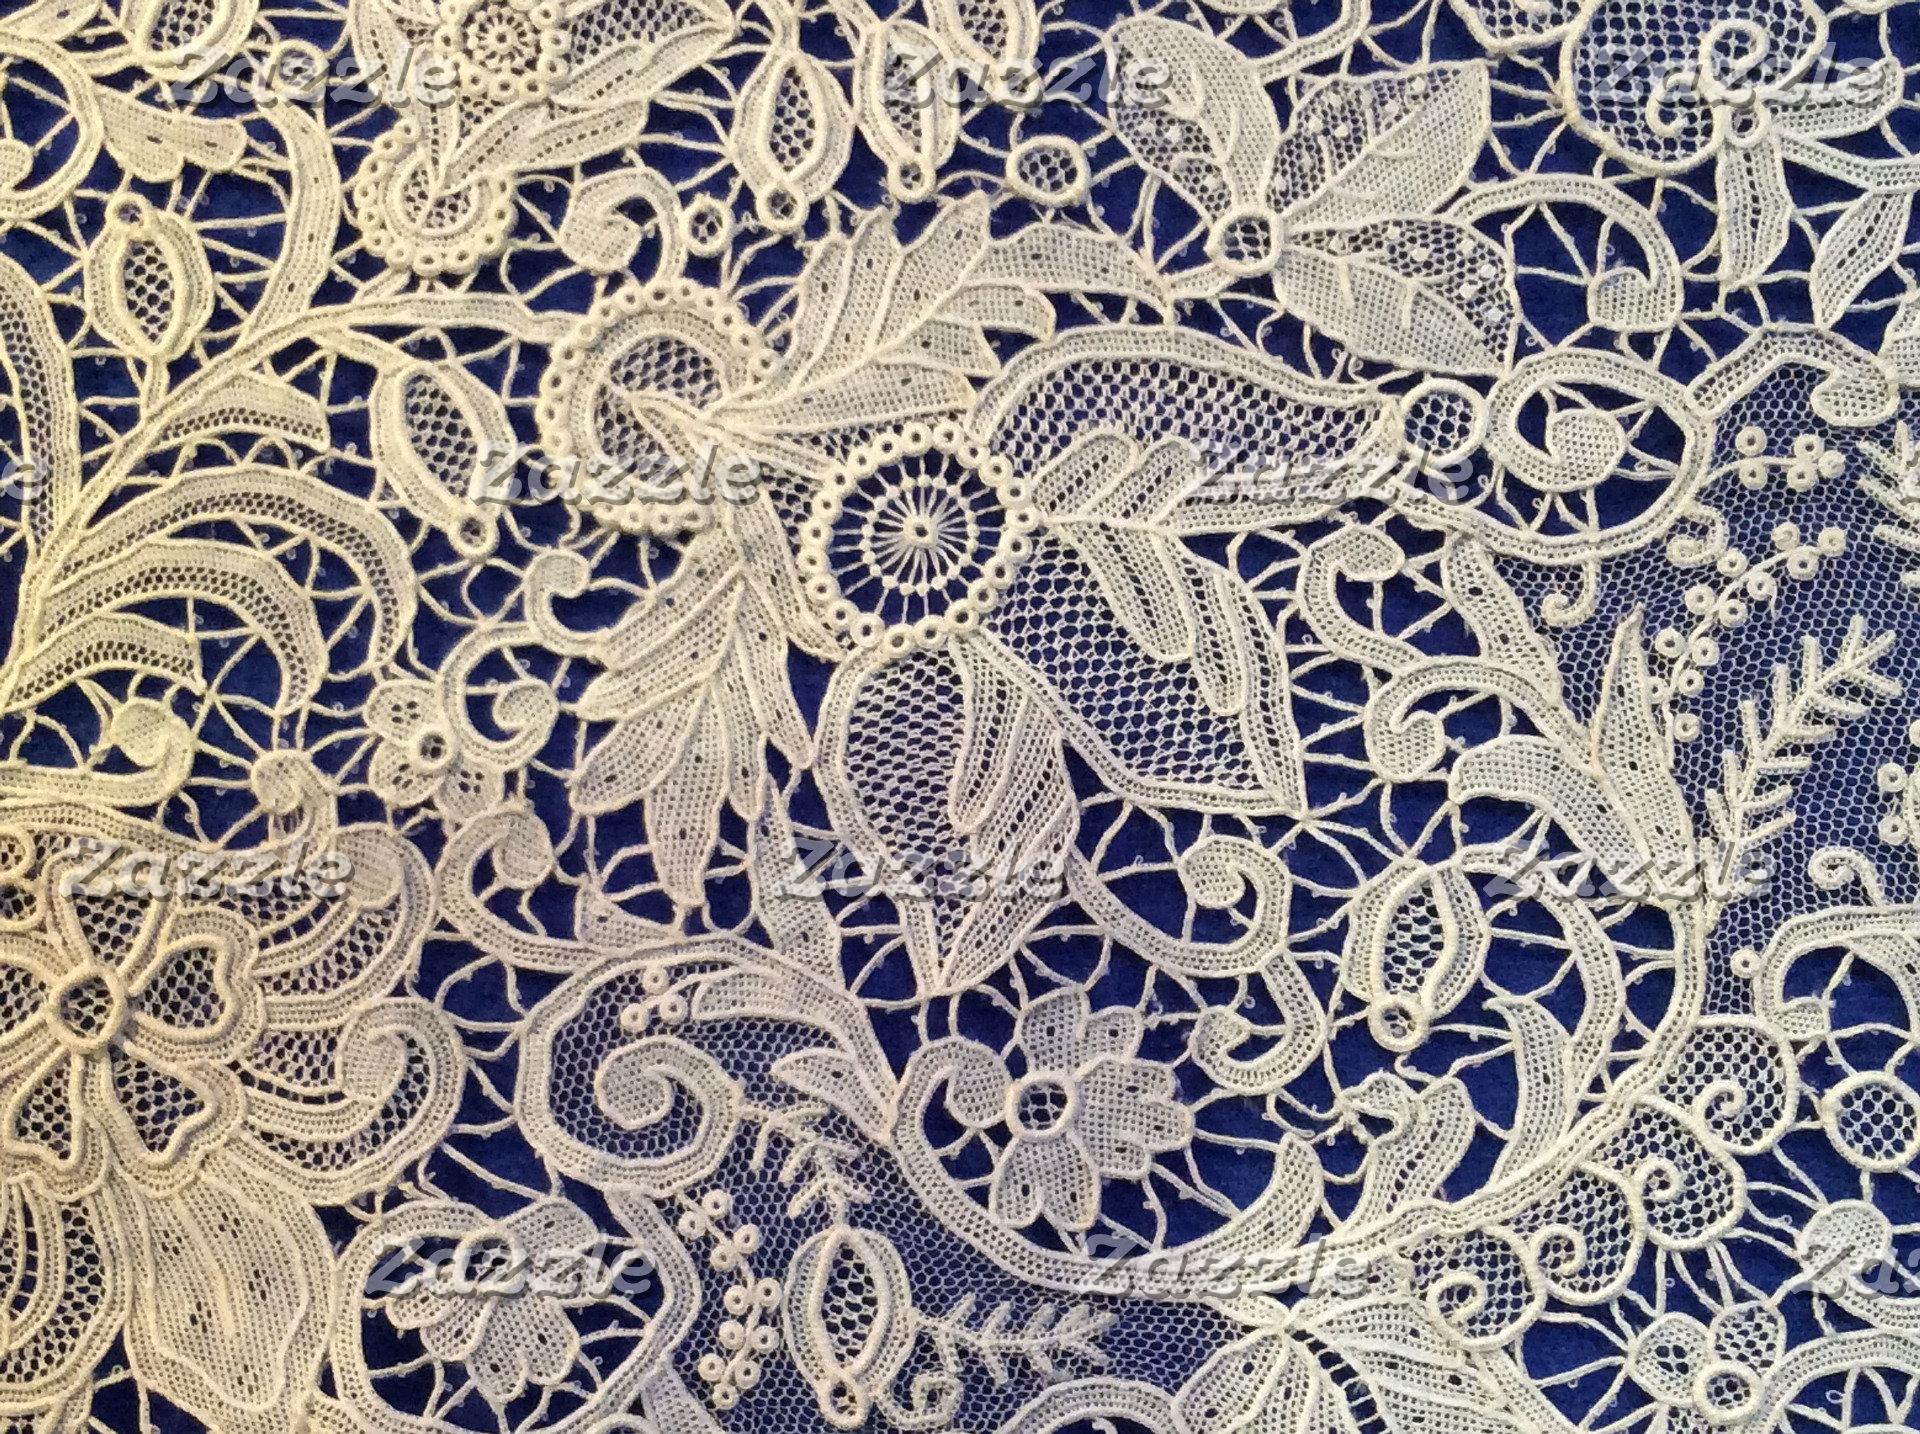 Creamy Ivory and Blue Lace Wedding Set